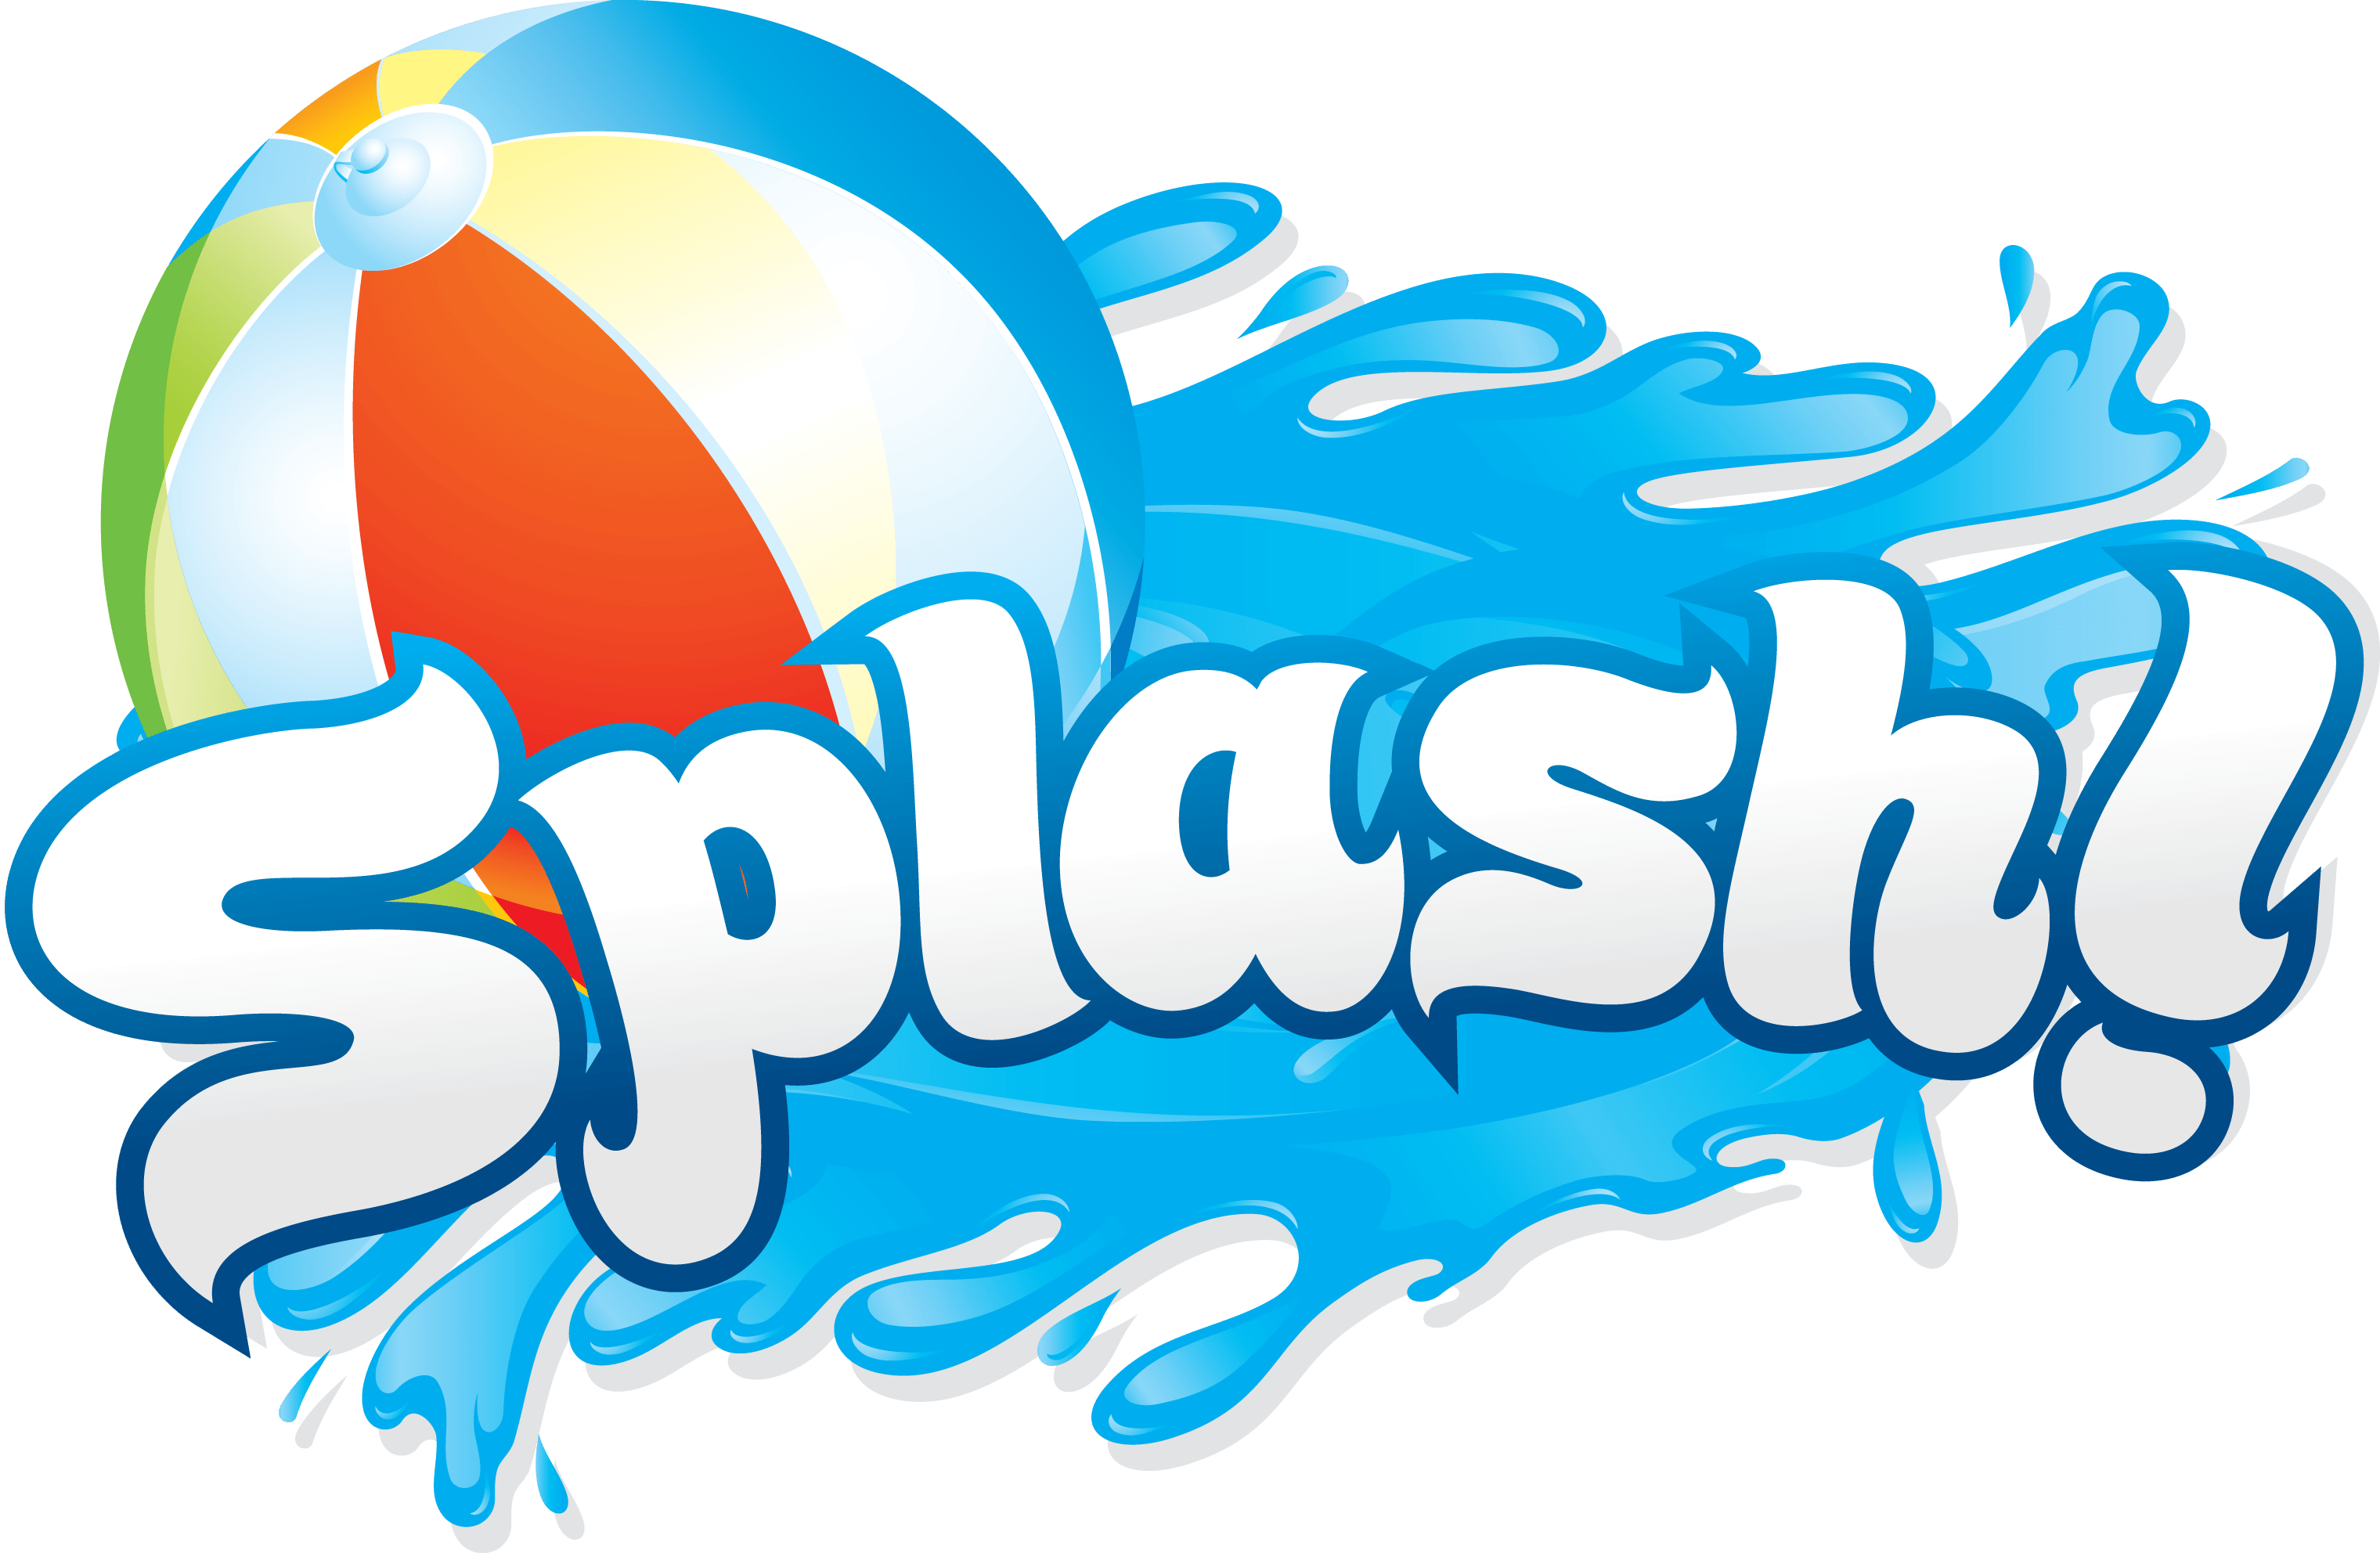 Splish splash i ws taking a bath clipart png vector transparent Borde de Clip Clip de Pool Splash | Birthday Party ideas for ... vector transparent